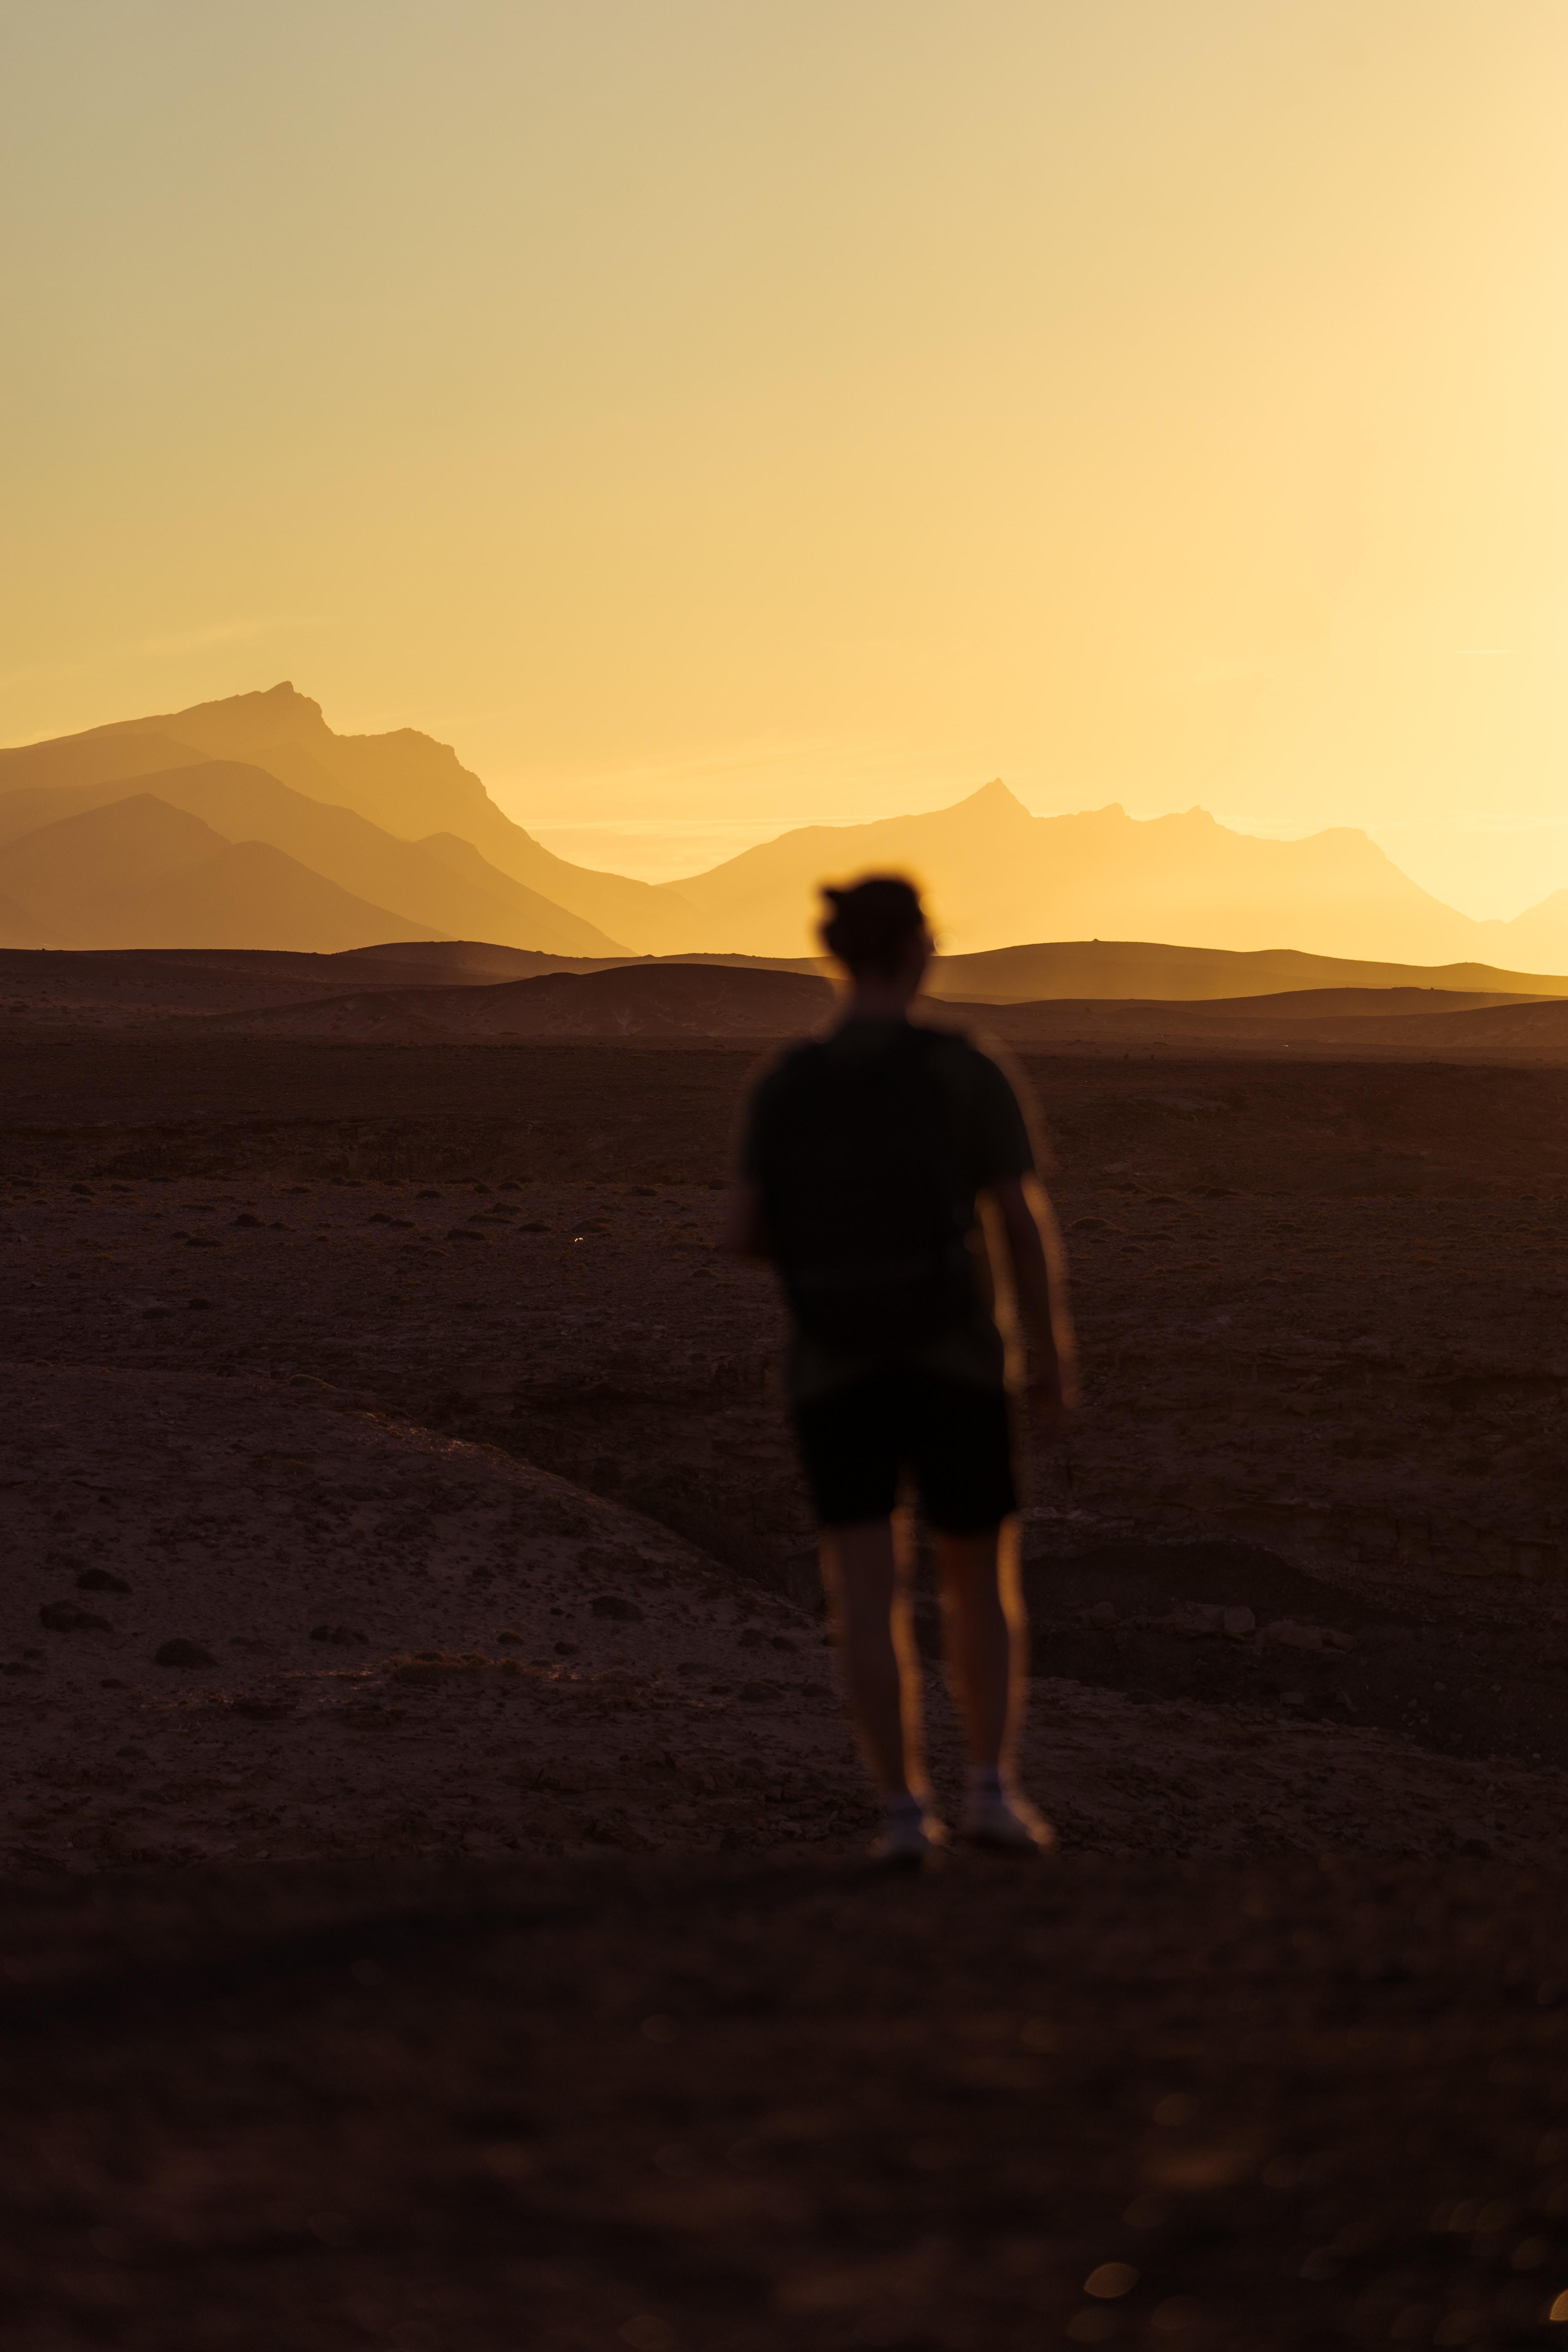 person walking on desert during golden hour